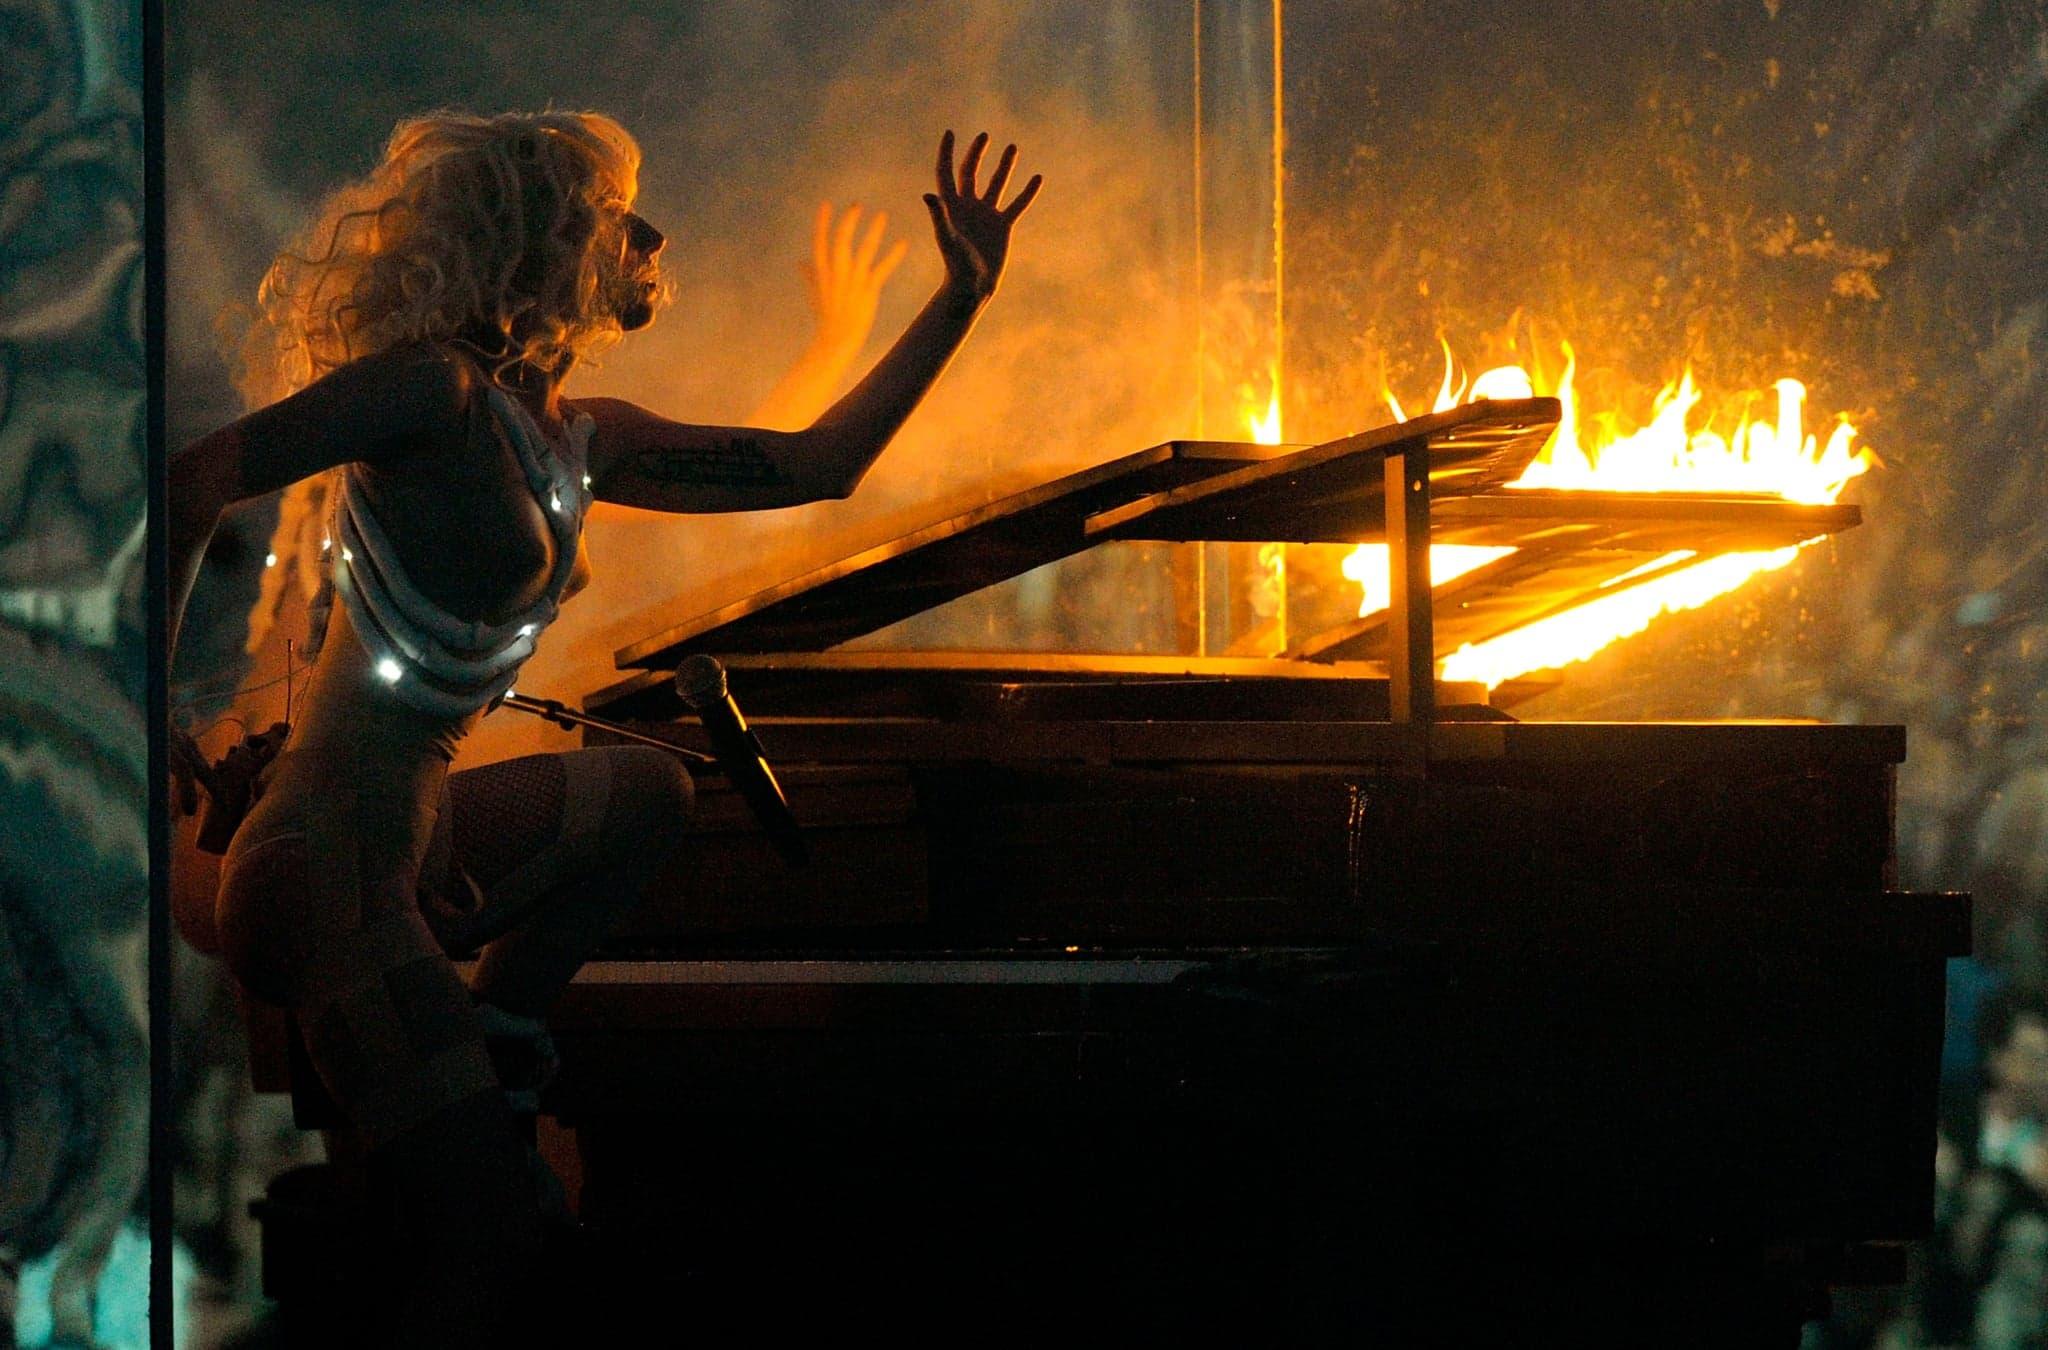 File:American Music Awards 2009 4.jpg